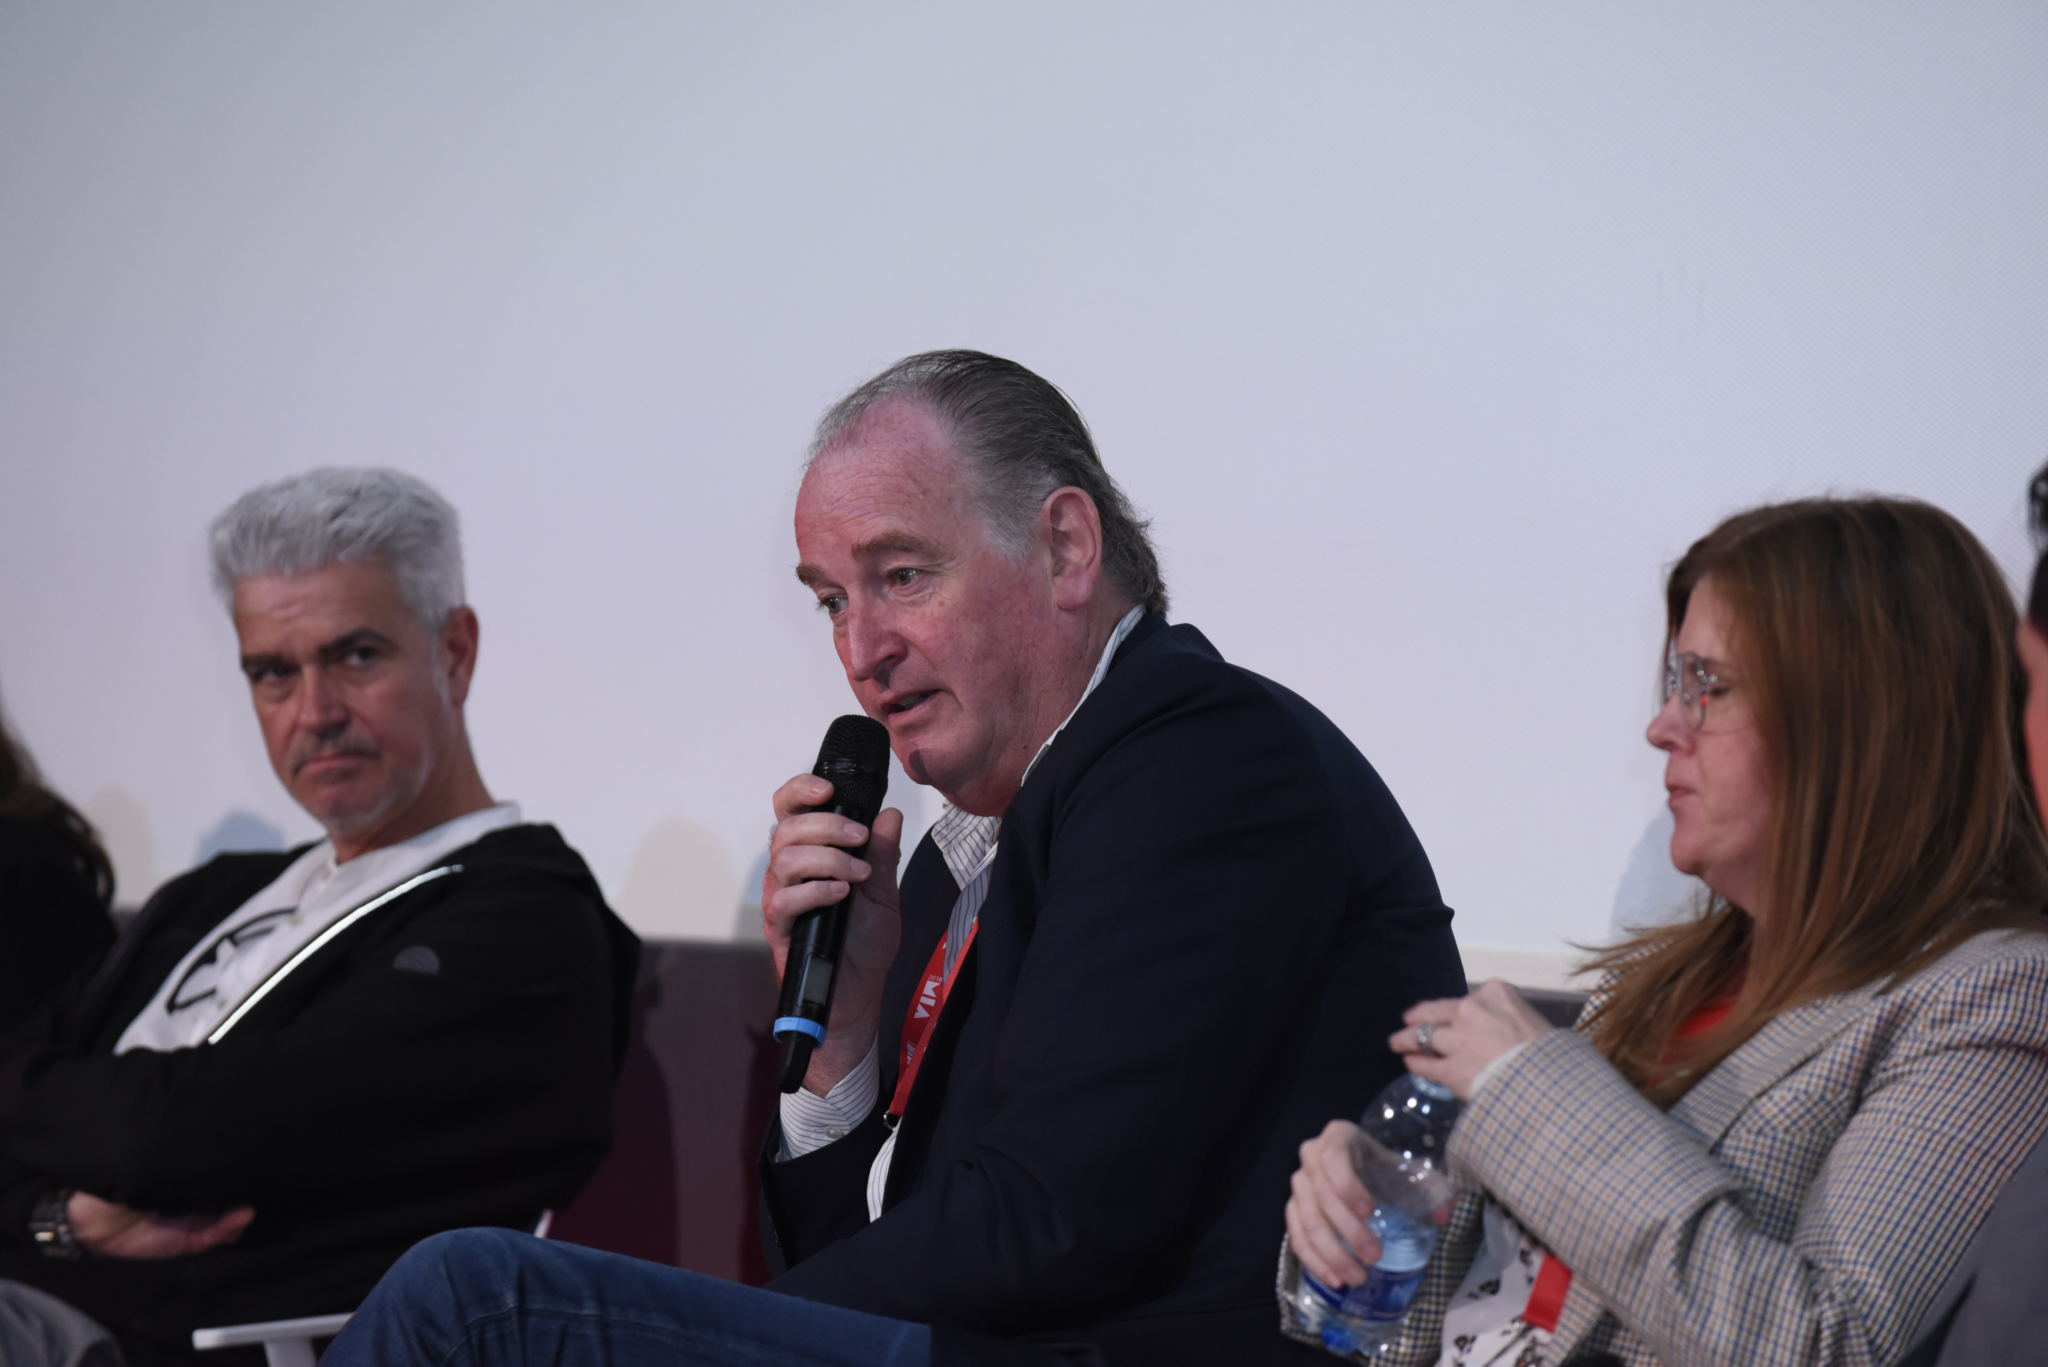 Nils Hartmann, Katie O'Connell Marsh